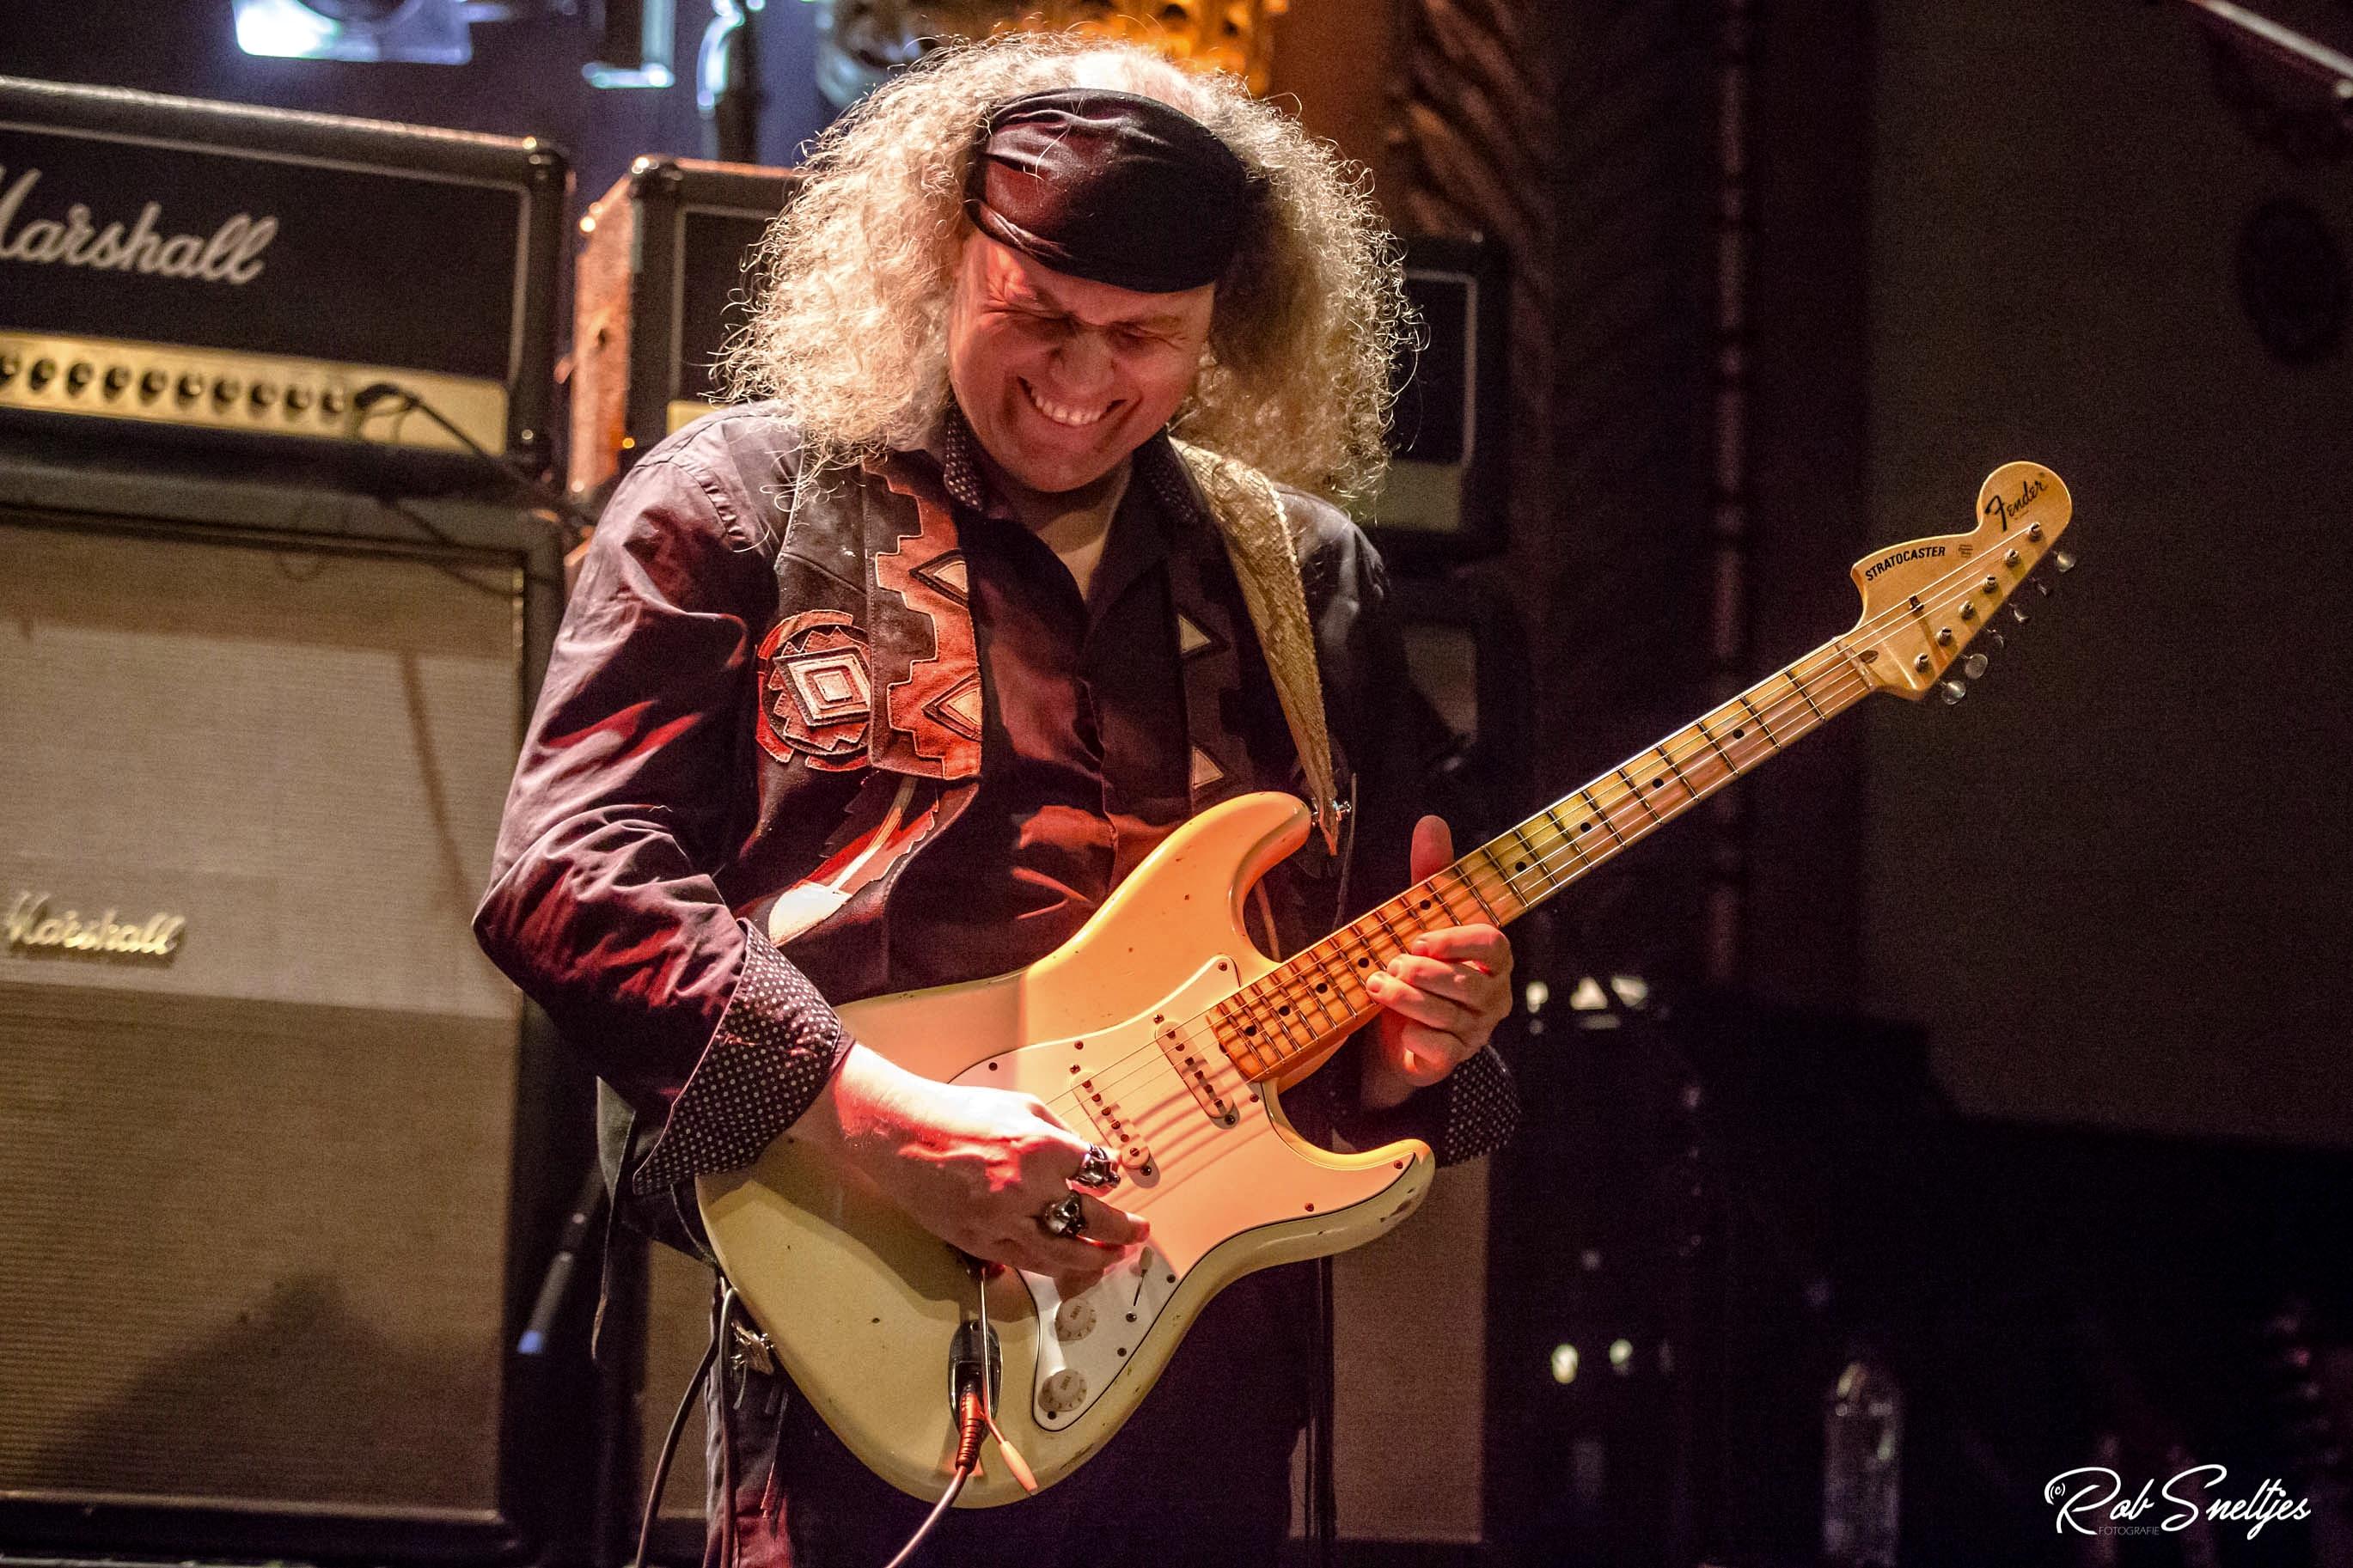 Julian-Sas-Band-Luxor-Live-Arnhem-2018-©RobSneltjes6K4A5273-copy-1